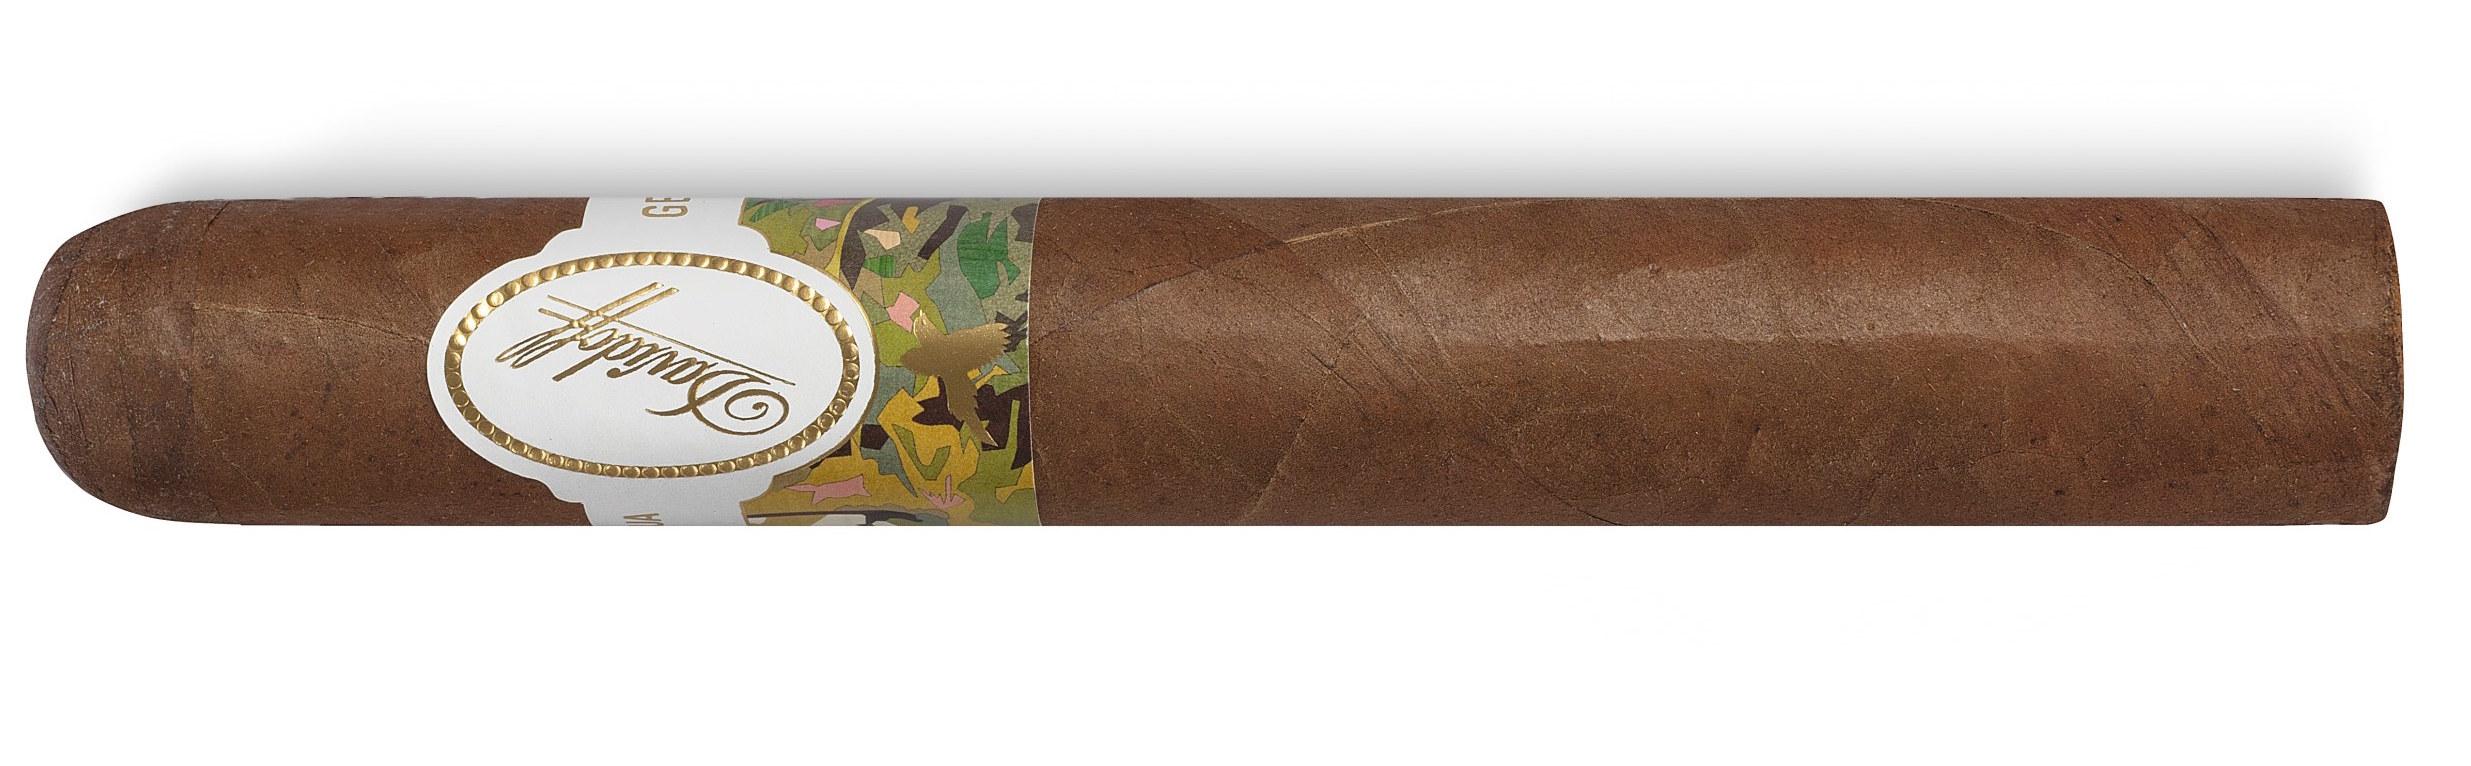 Davidoff_Masterpiece_Humidor–Damajagua_Cigar